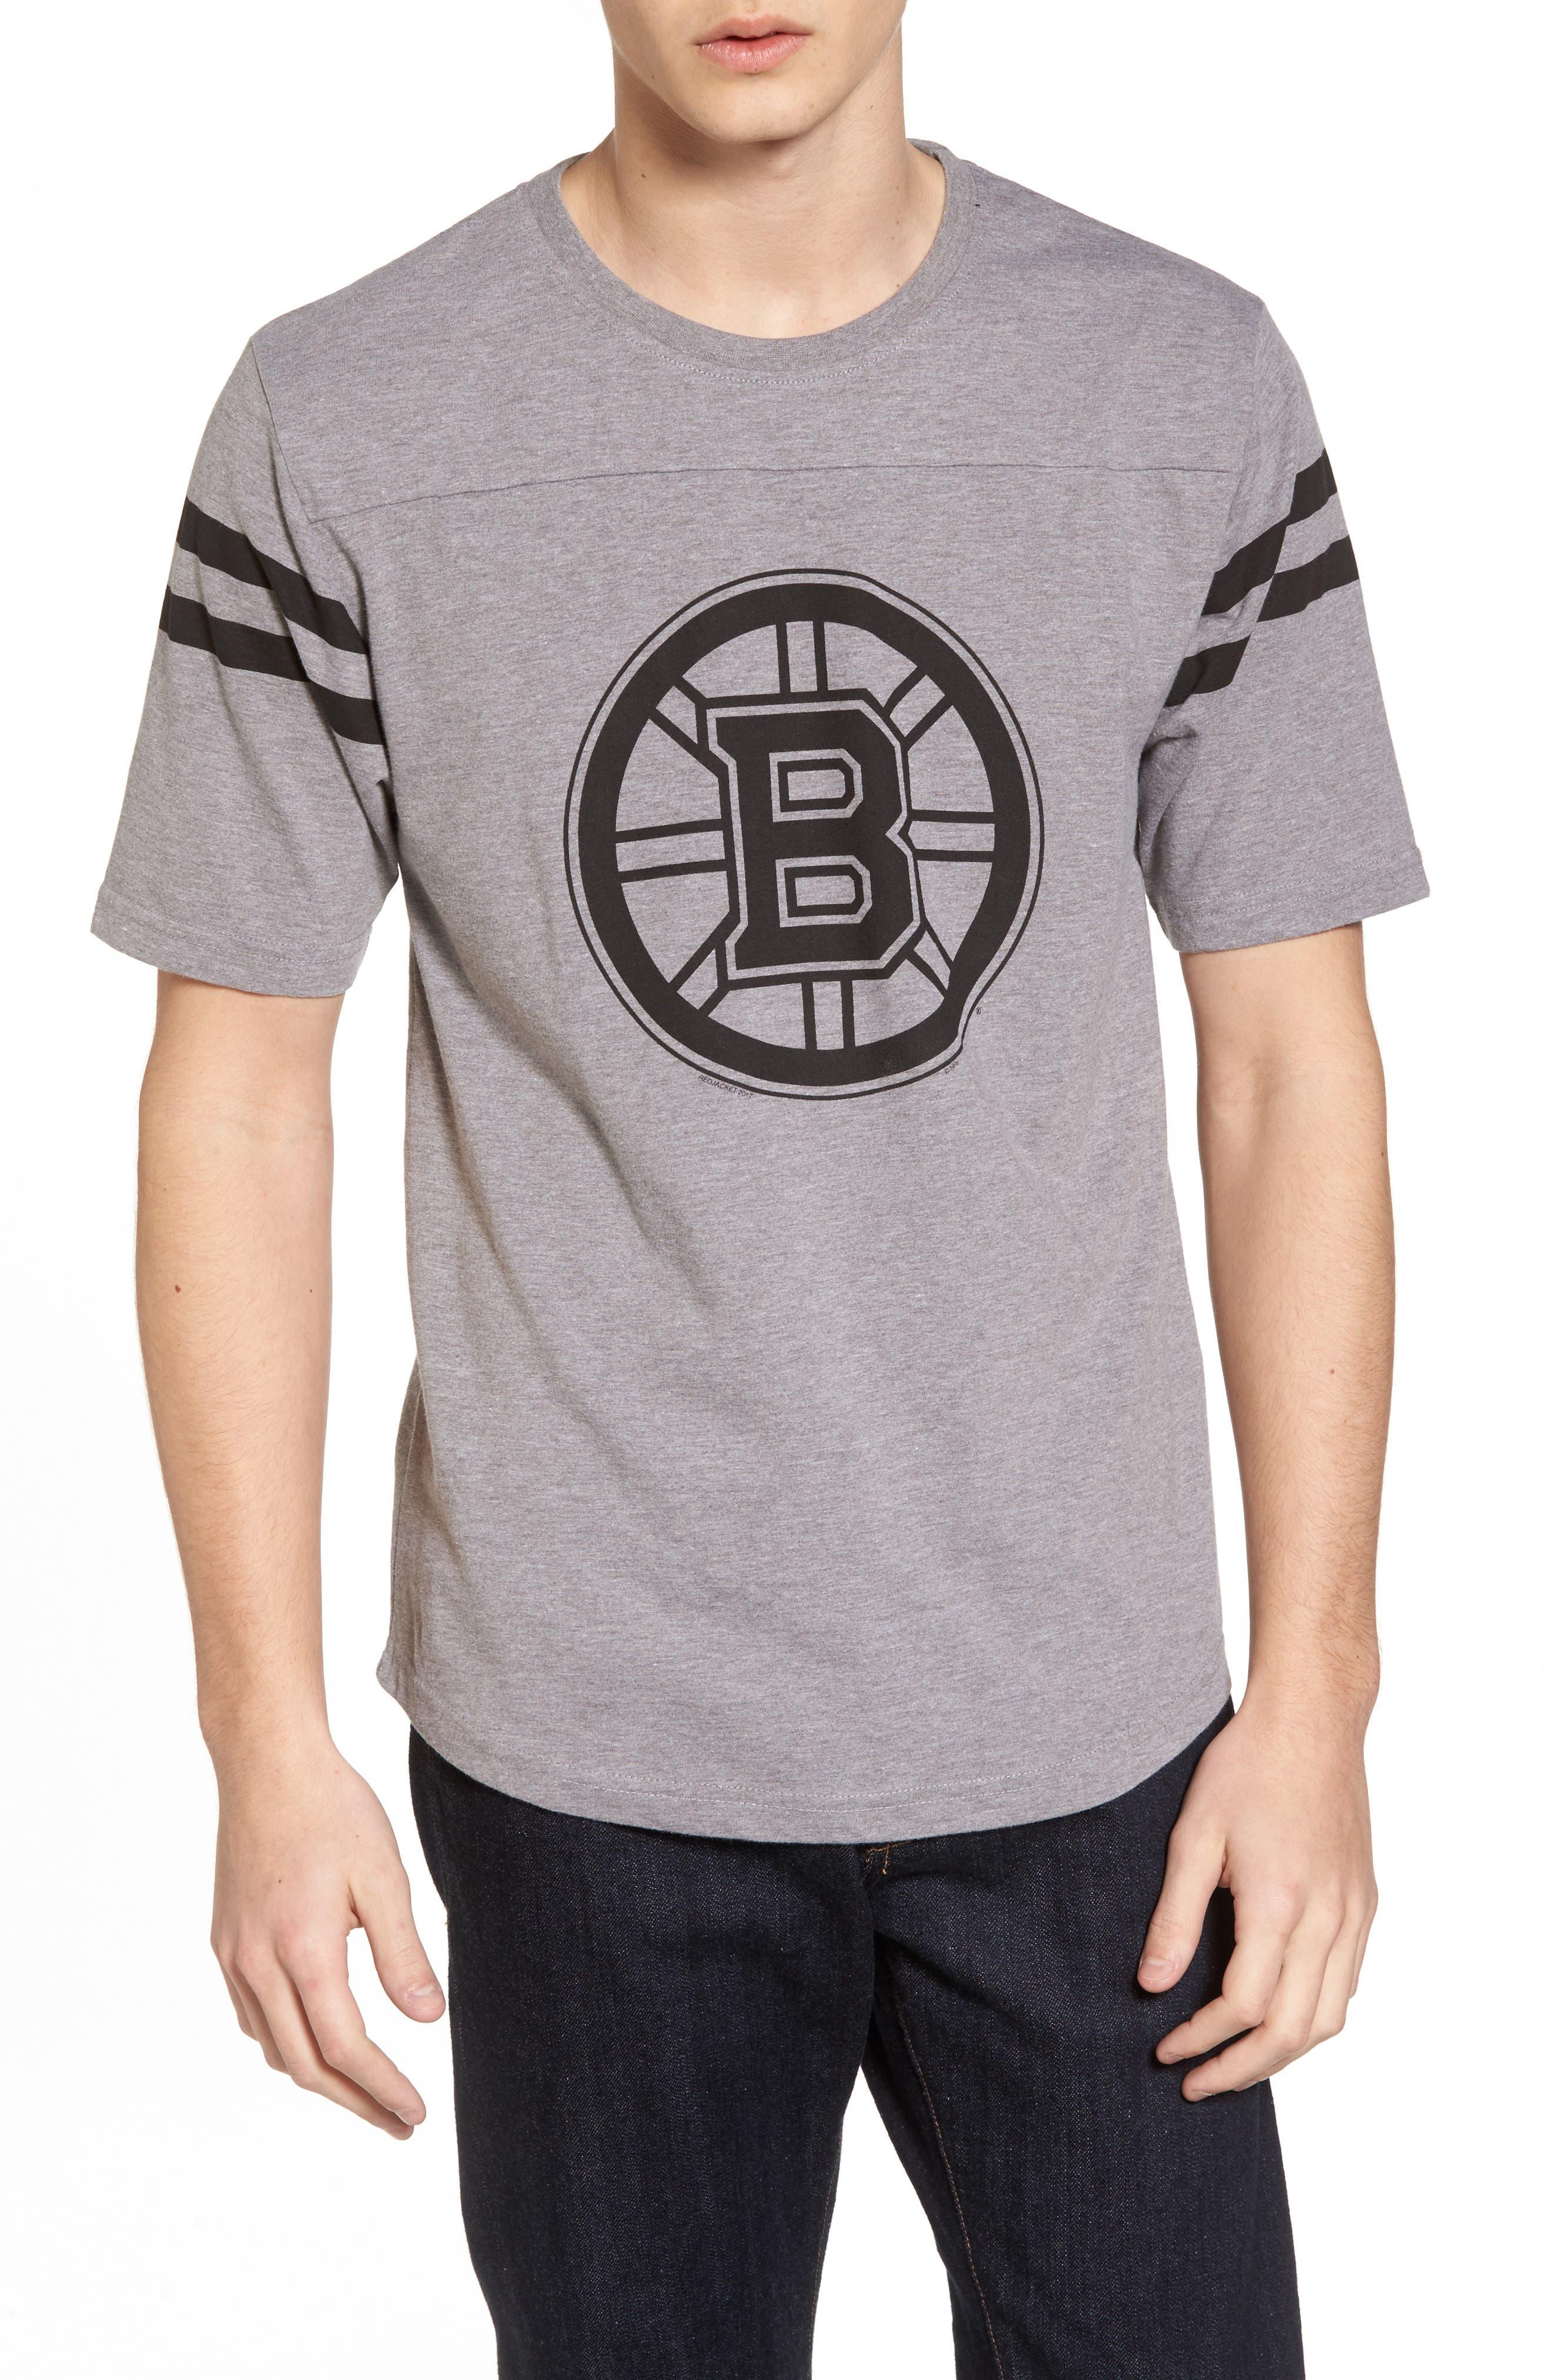 Crosby Boston Bruins T-Shirt,                         Main,                         color, Heather Grey